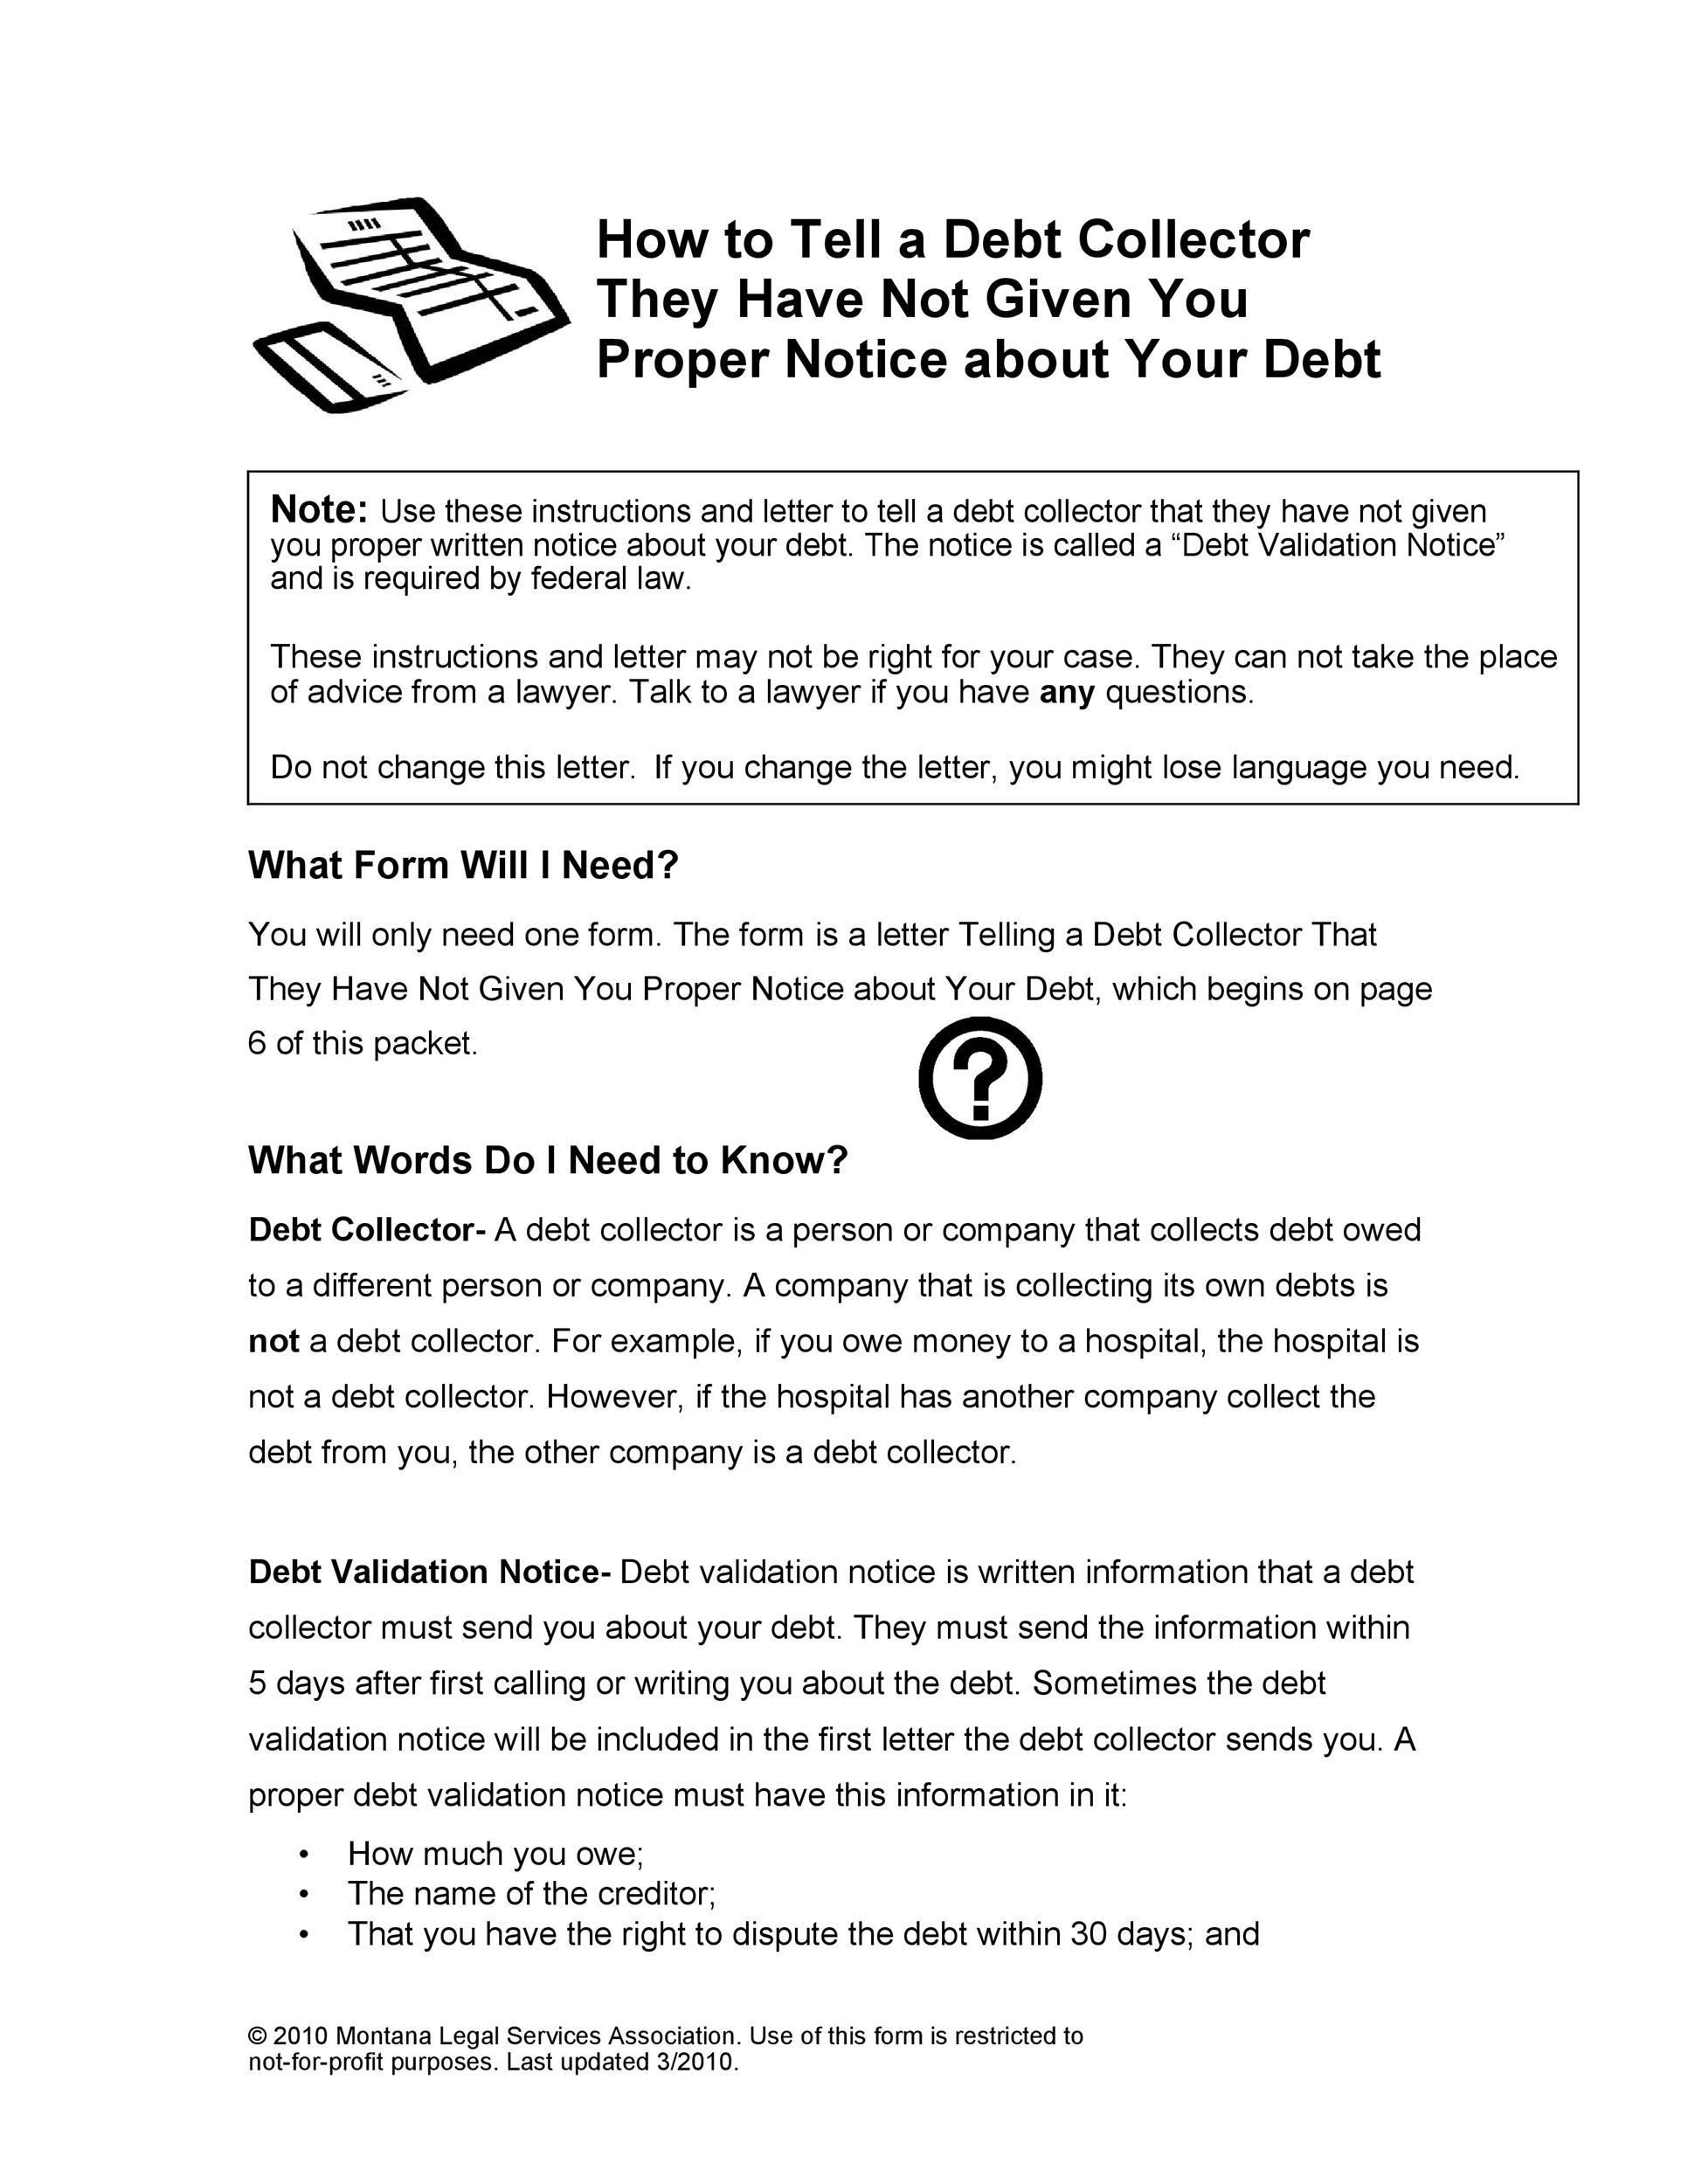 Free debt validation letter 07